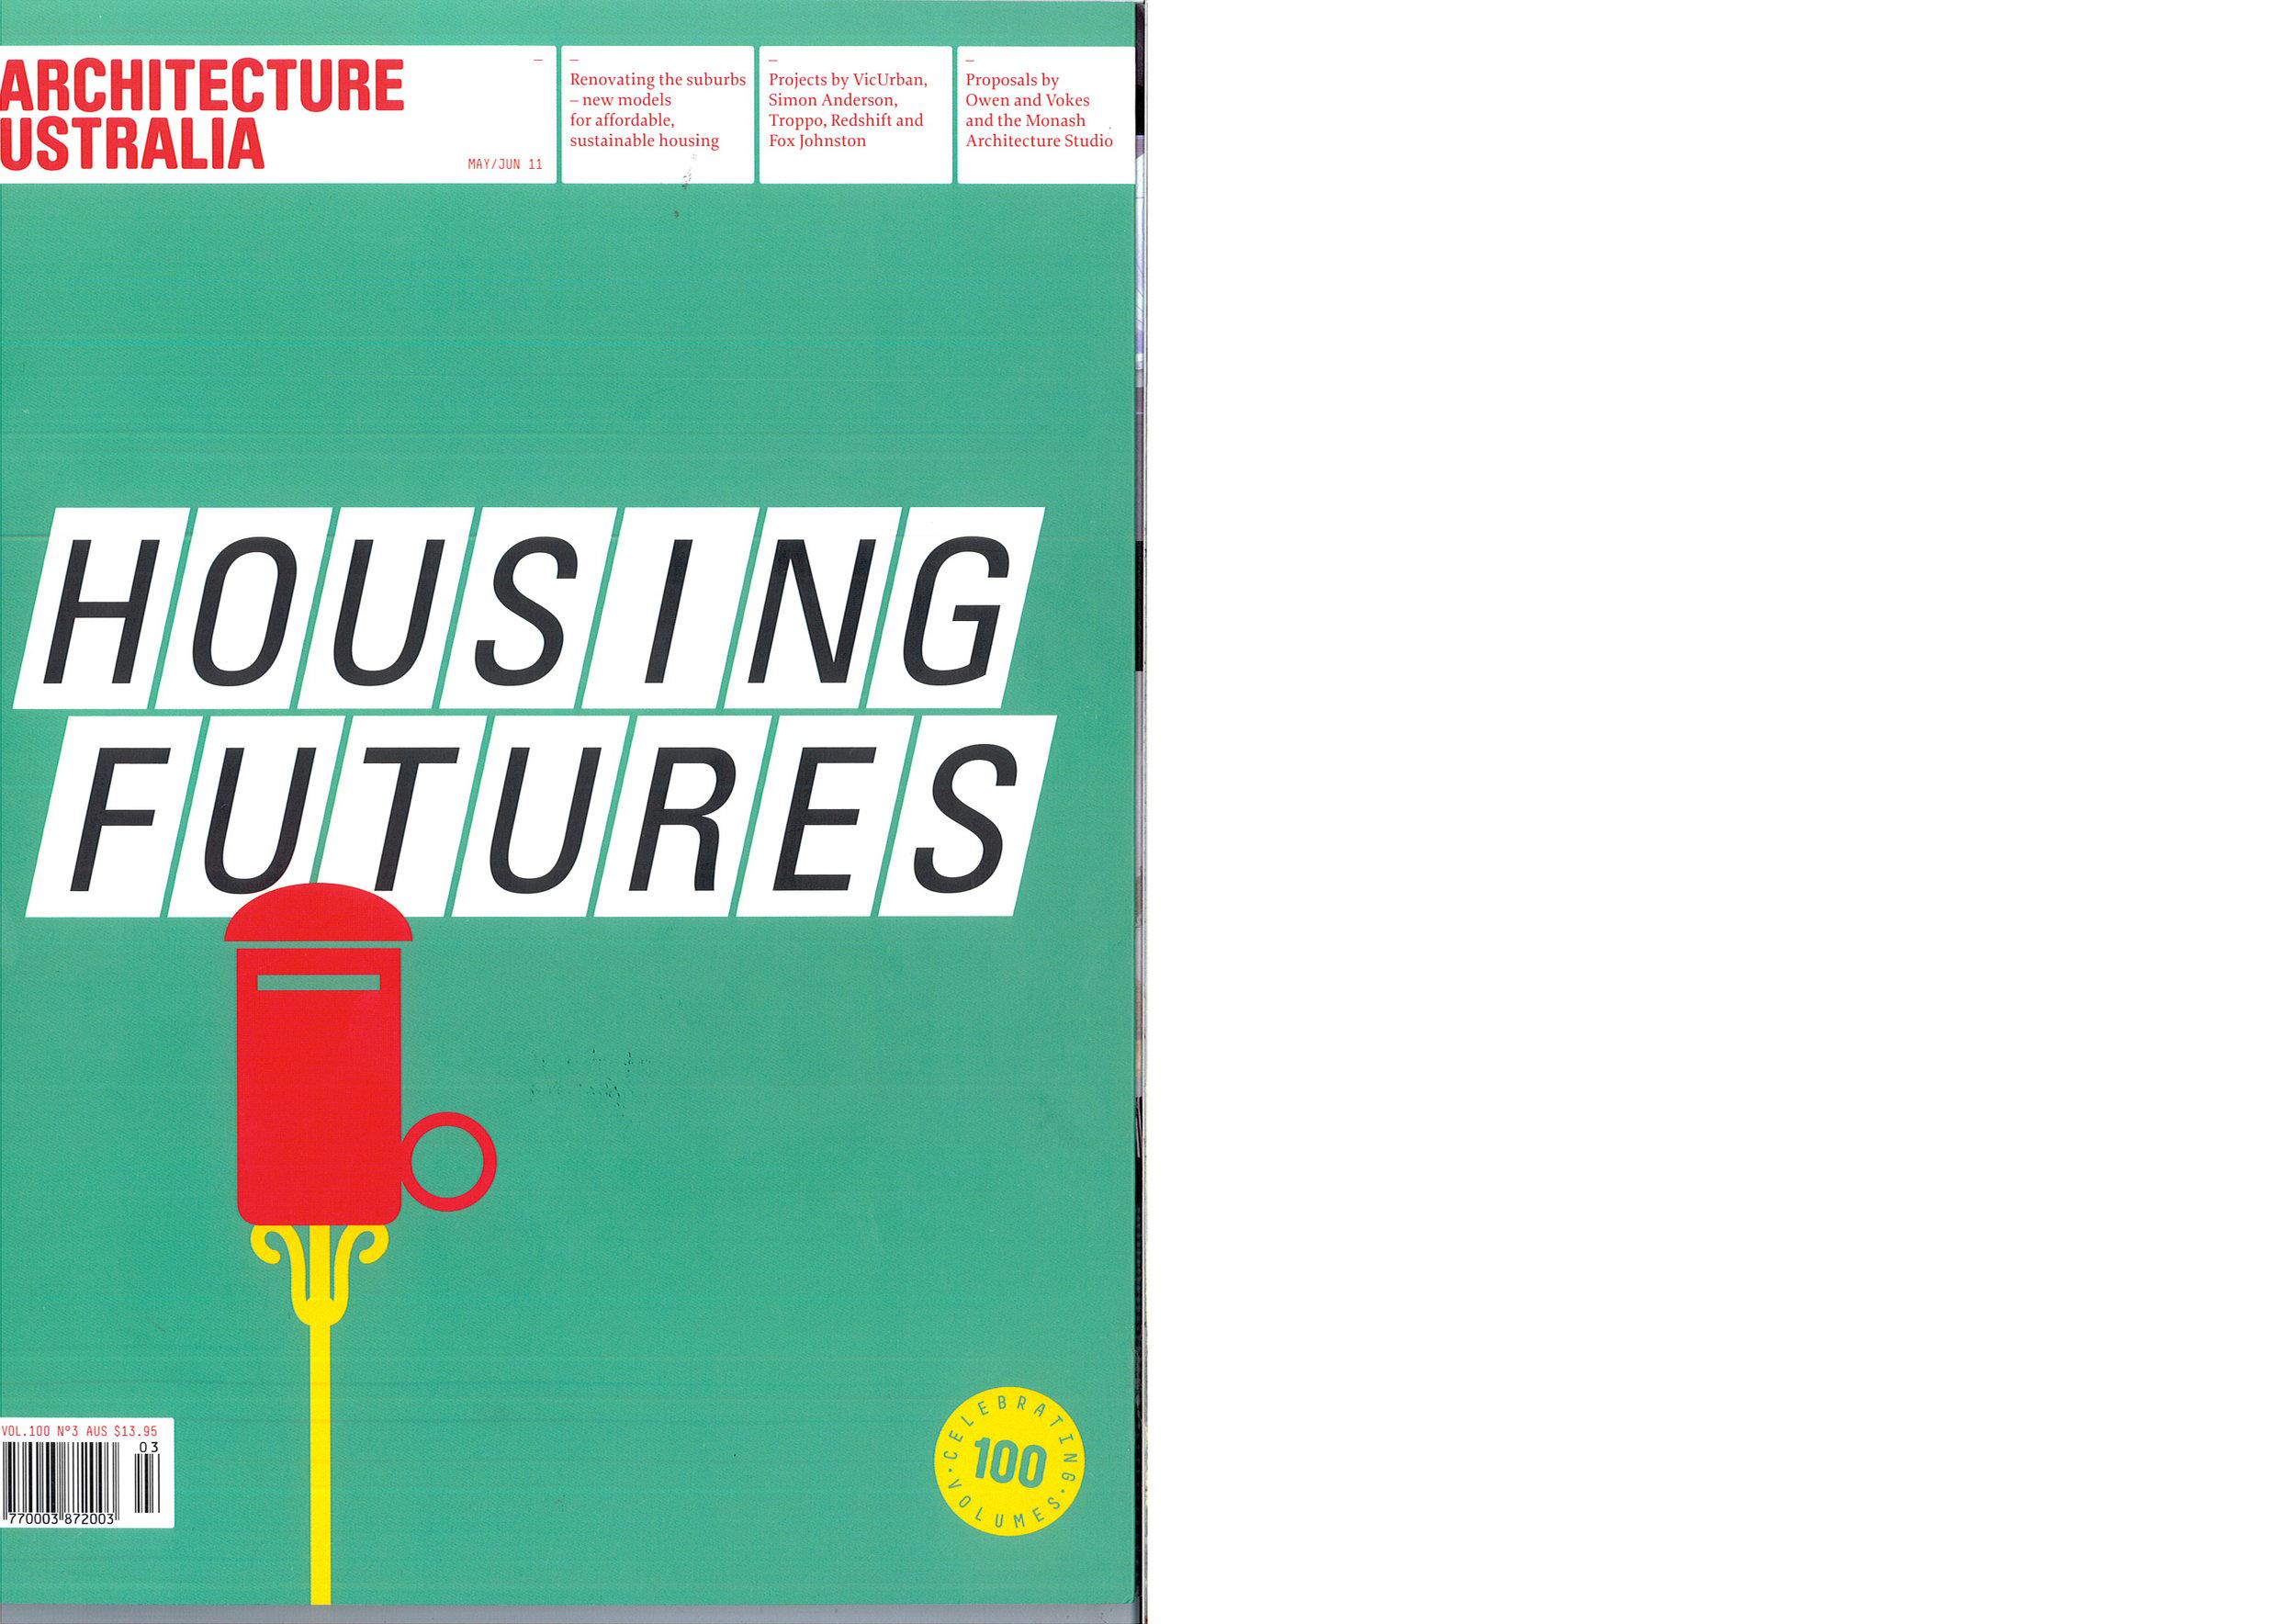 2011_Architecture Australia_Habitat 21_Page_1.jpg